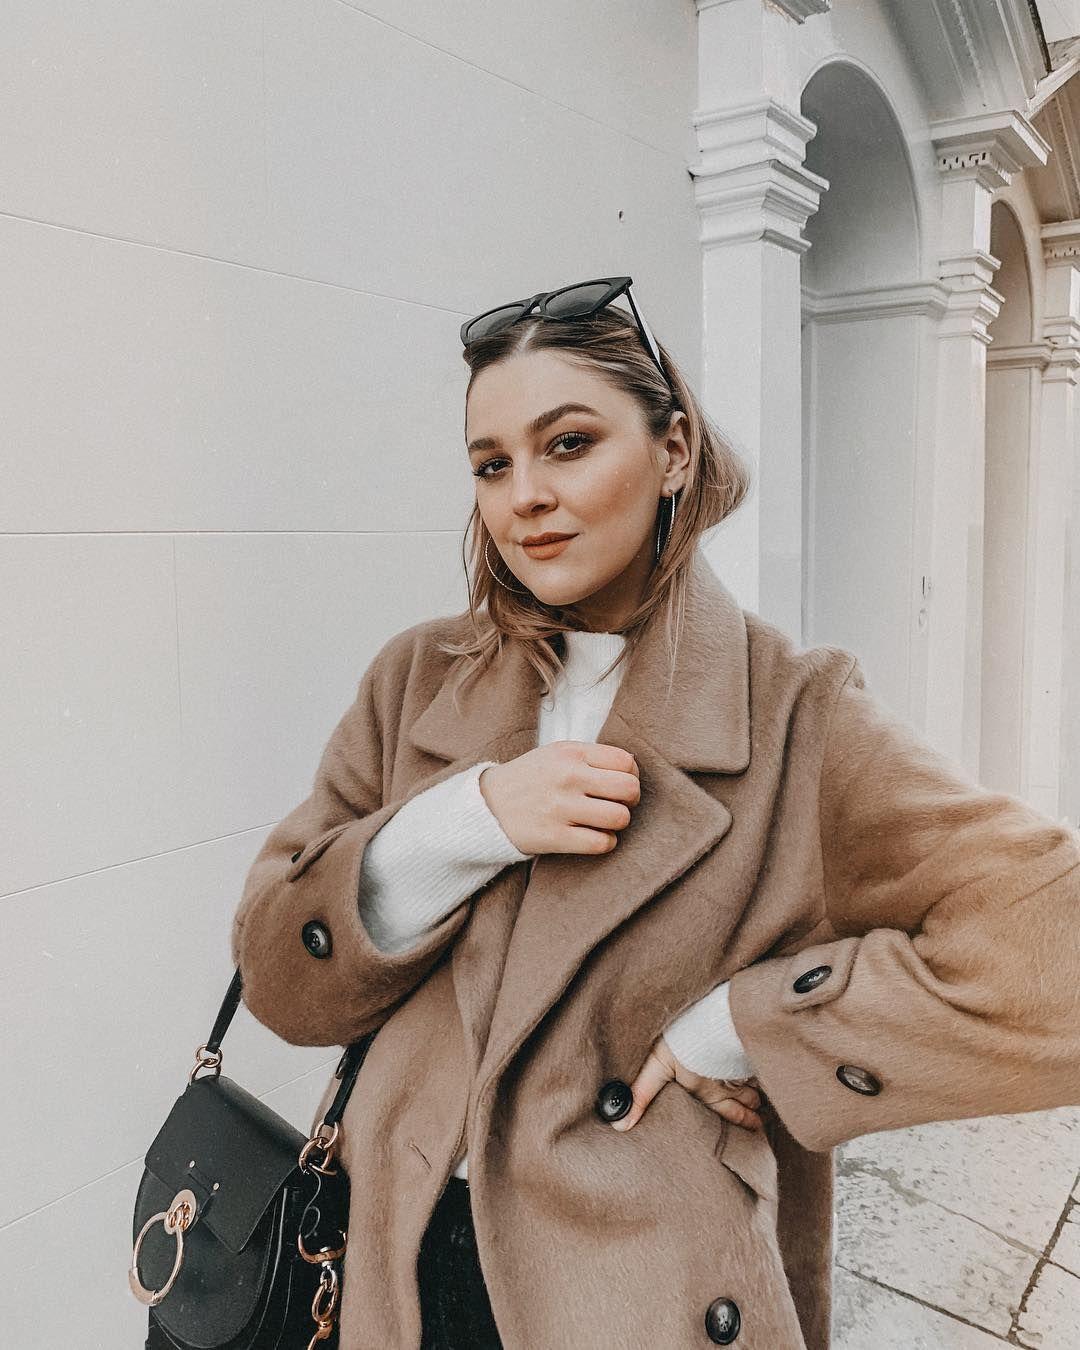 Pin On Fashion X Fall/Winter